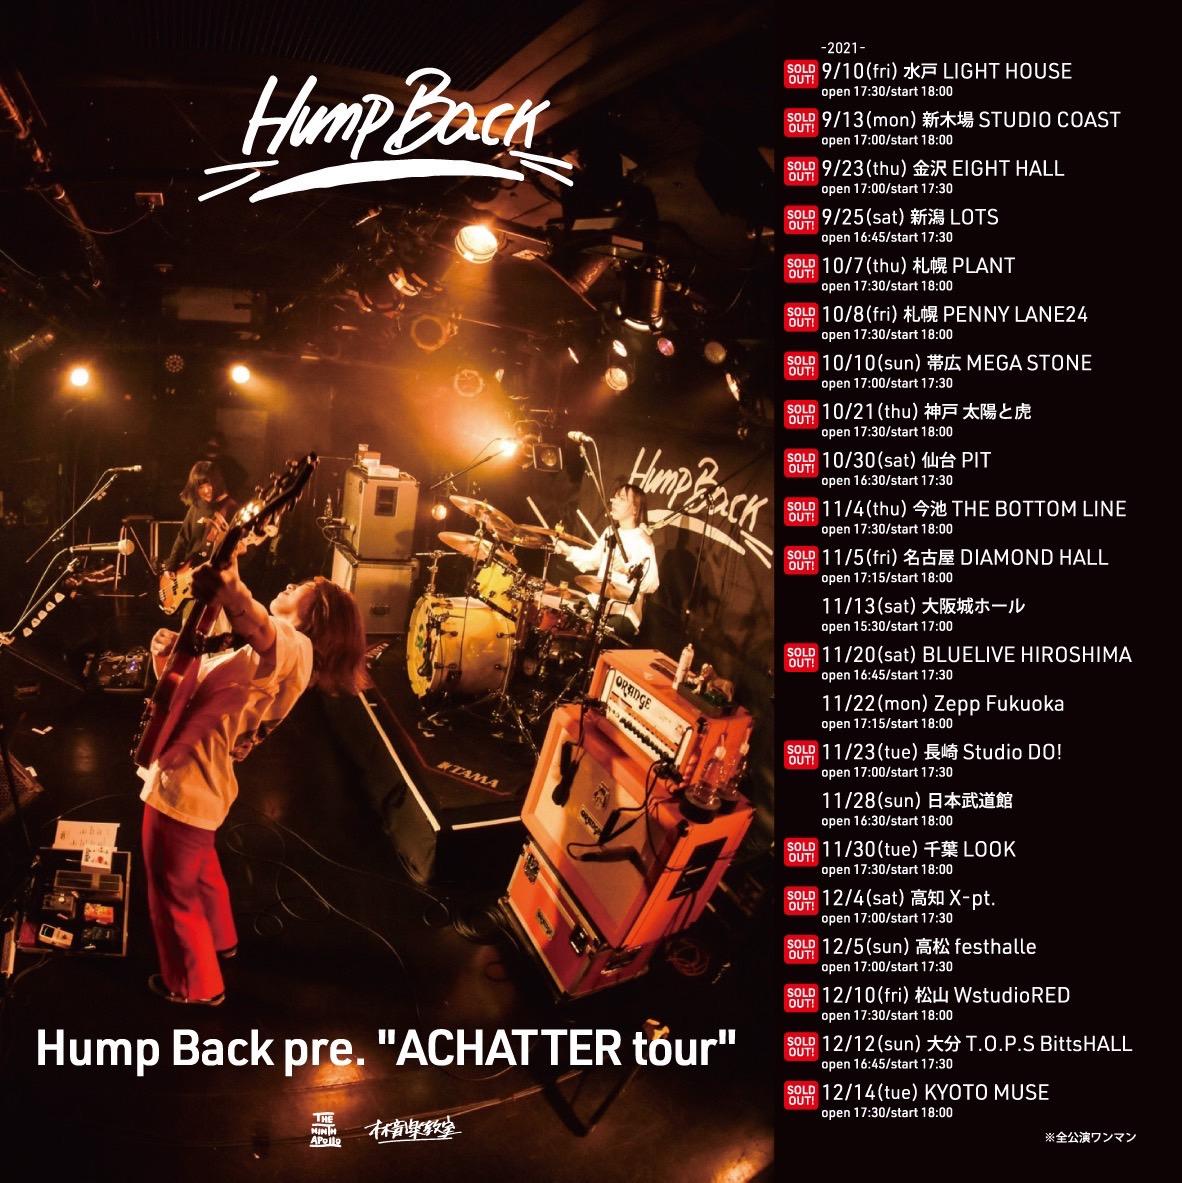 Hump Back_売り切れ告知画像 0904